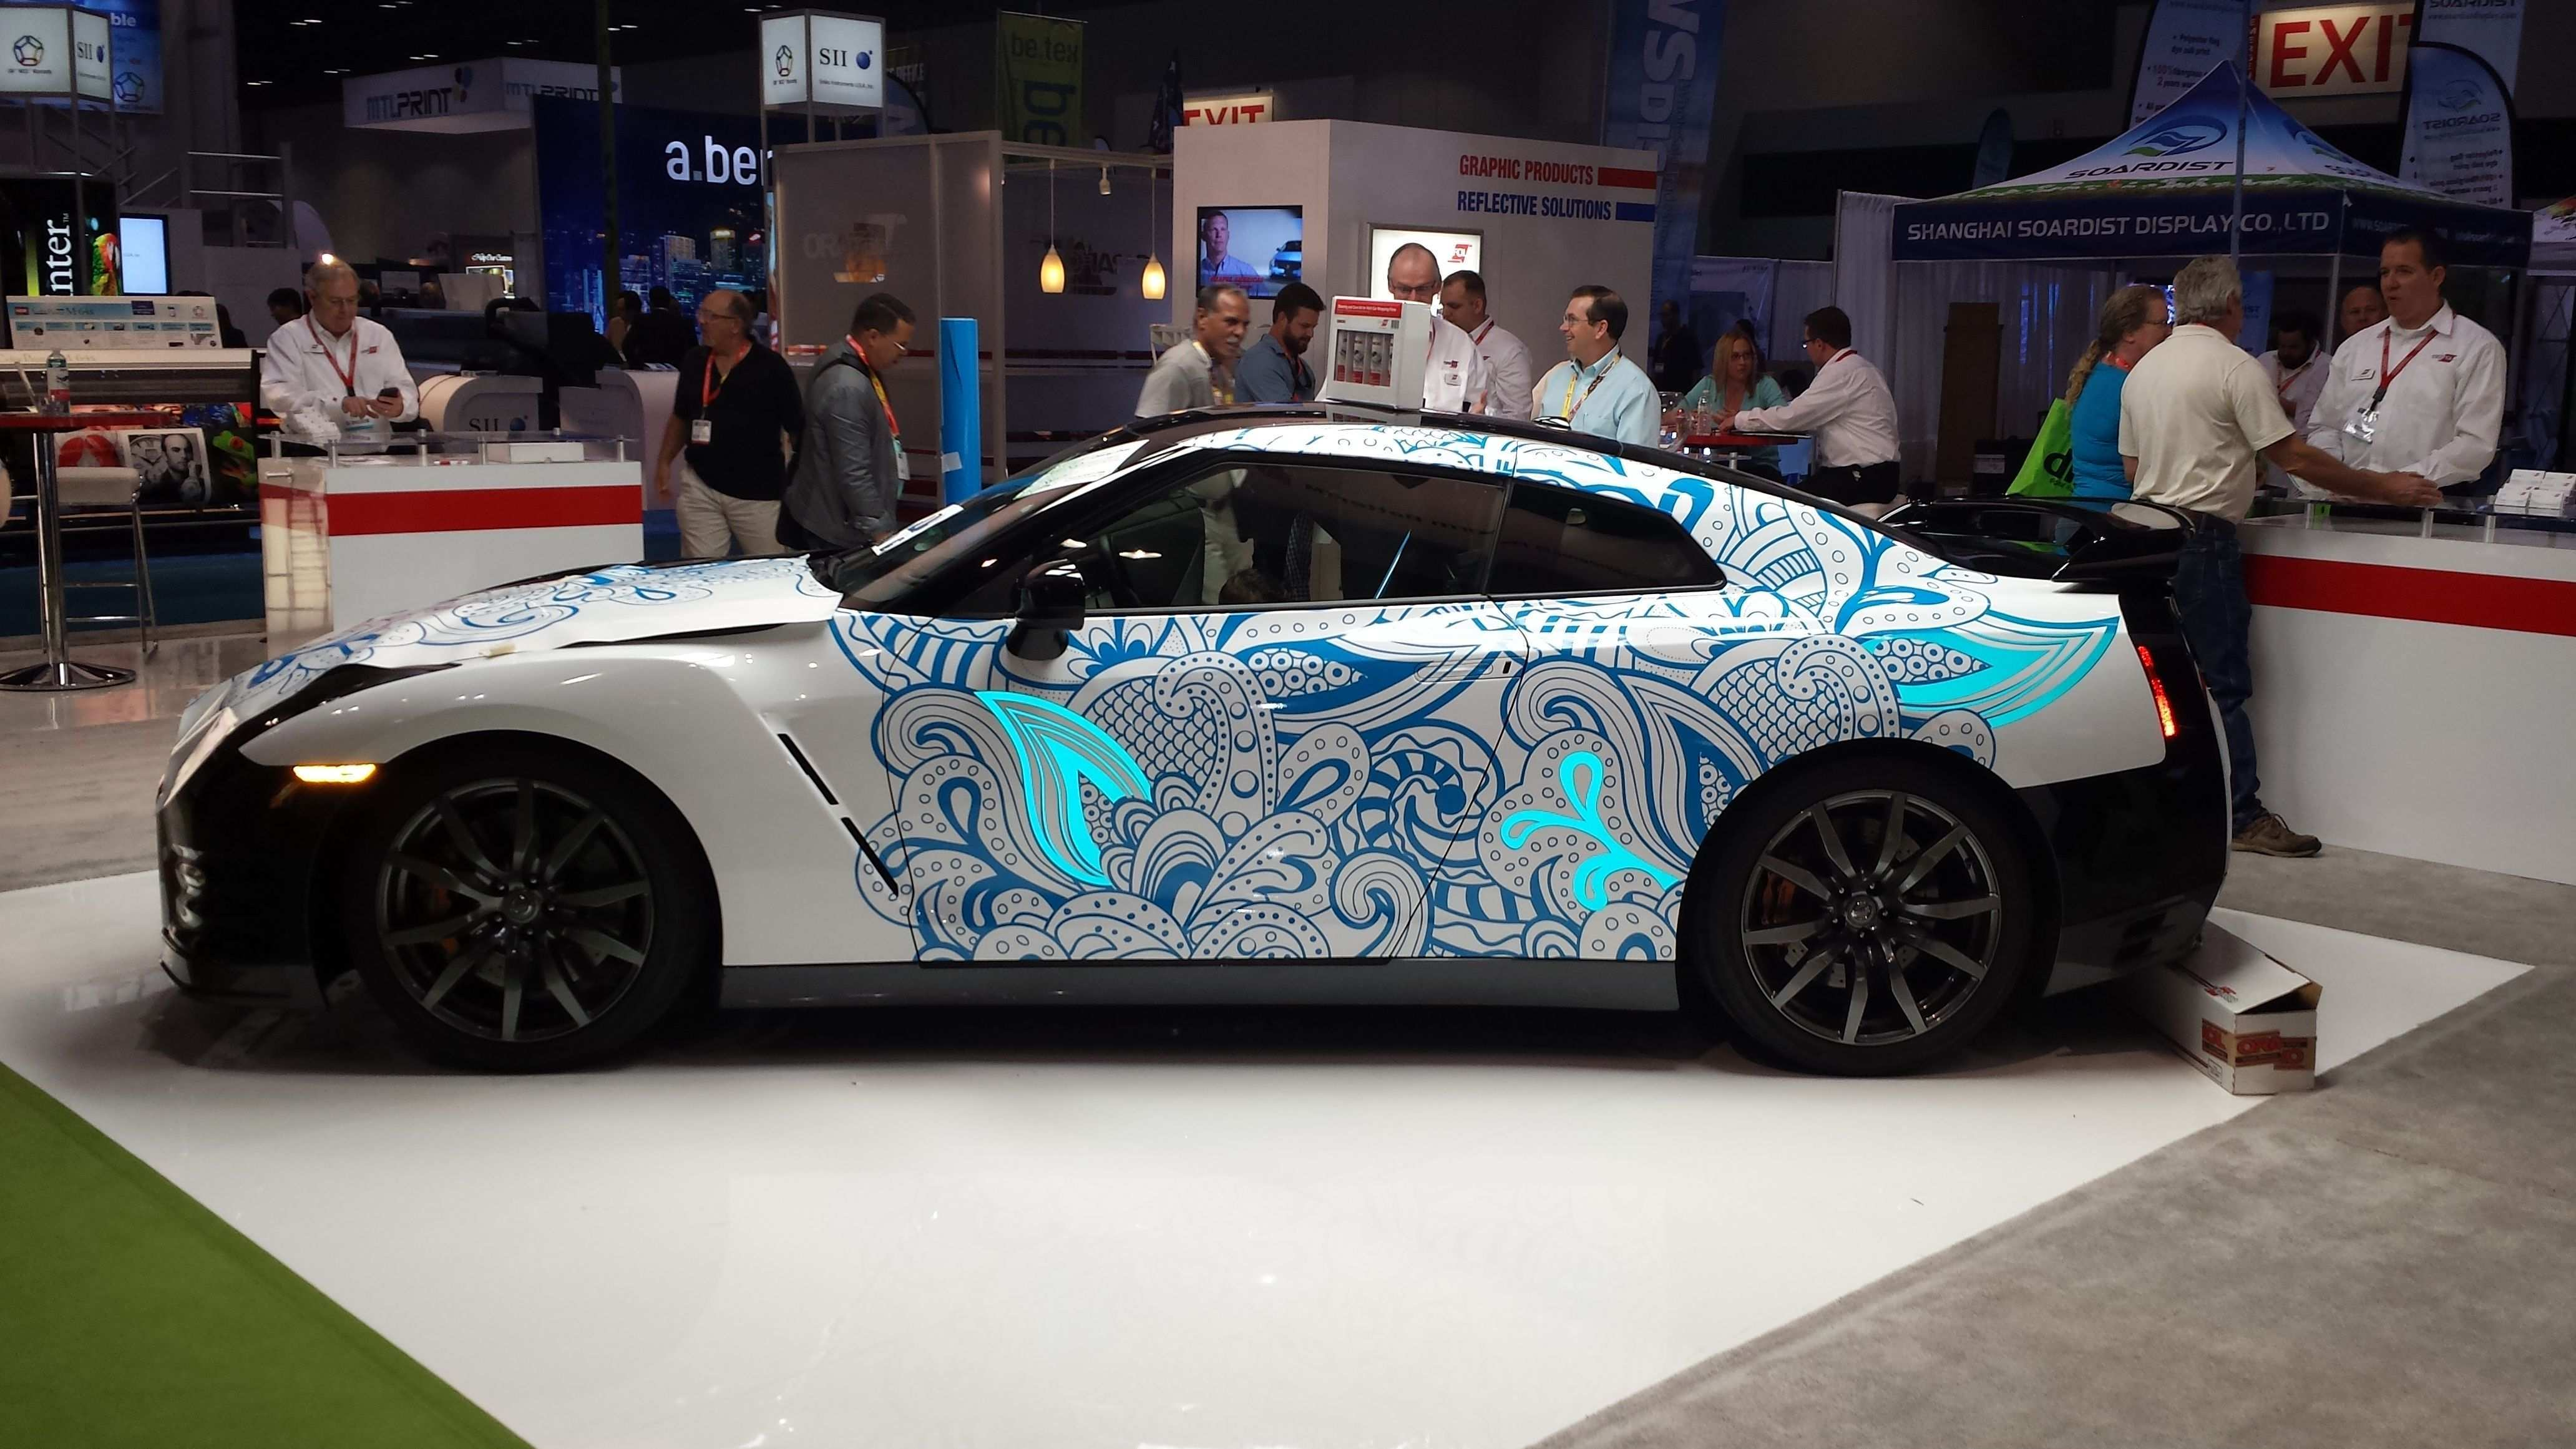 Pin By Orafol Americas On Vehicle Graphics Vinyl Wrap Car Car Wrap Car Wrap Design